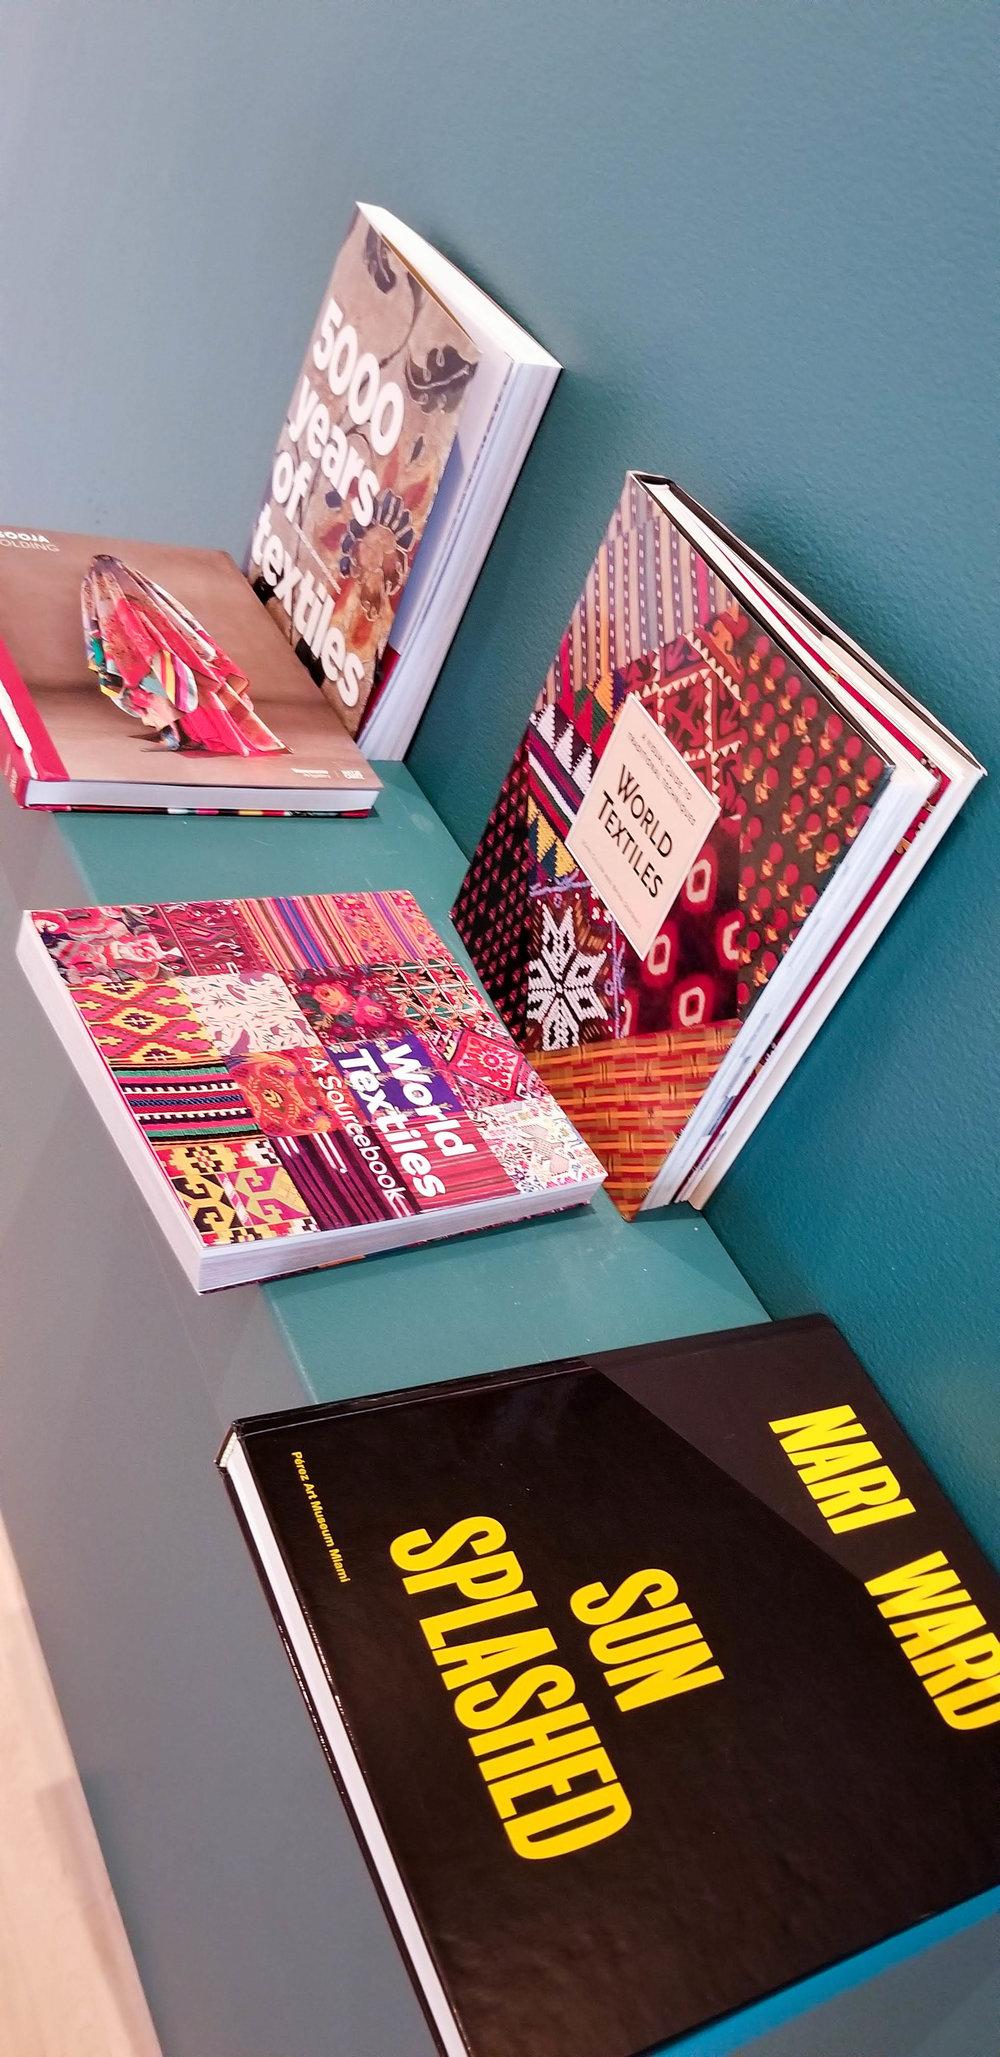 Exhibition Books